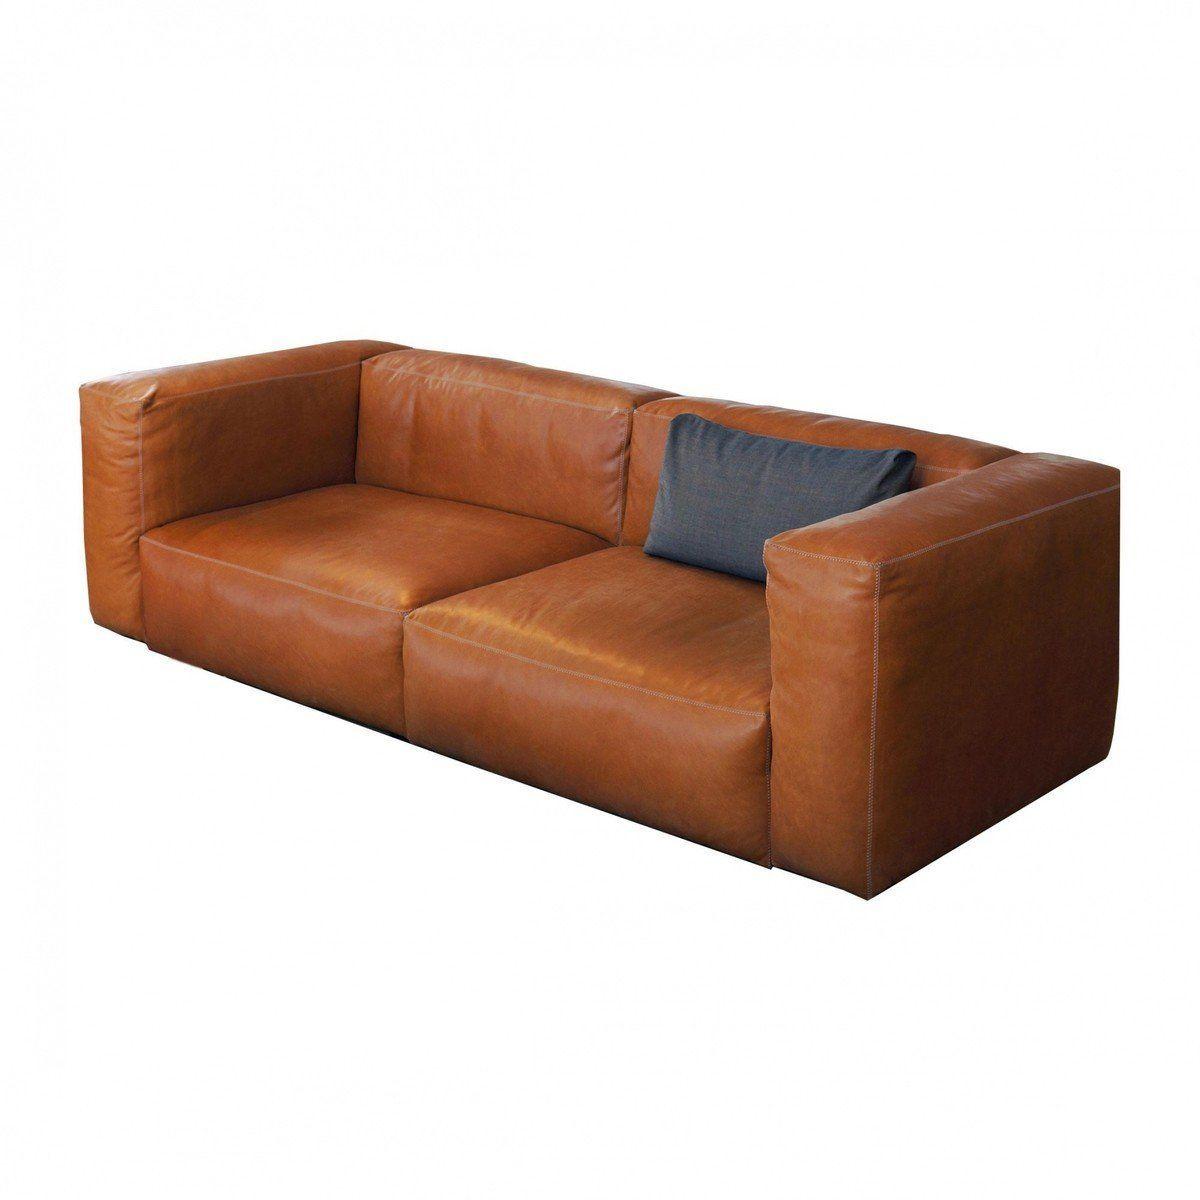 hay sofa mags leder art van slipcovers soft 2 5 seater leather ambientedirect